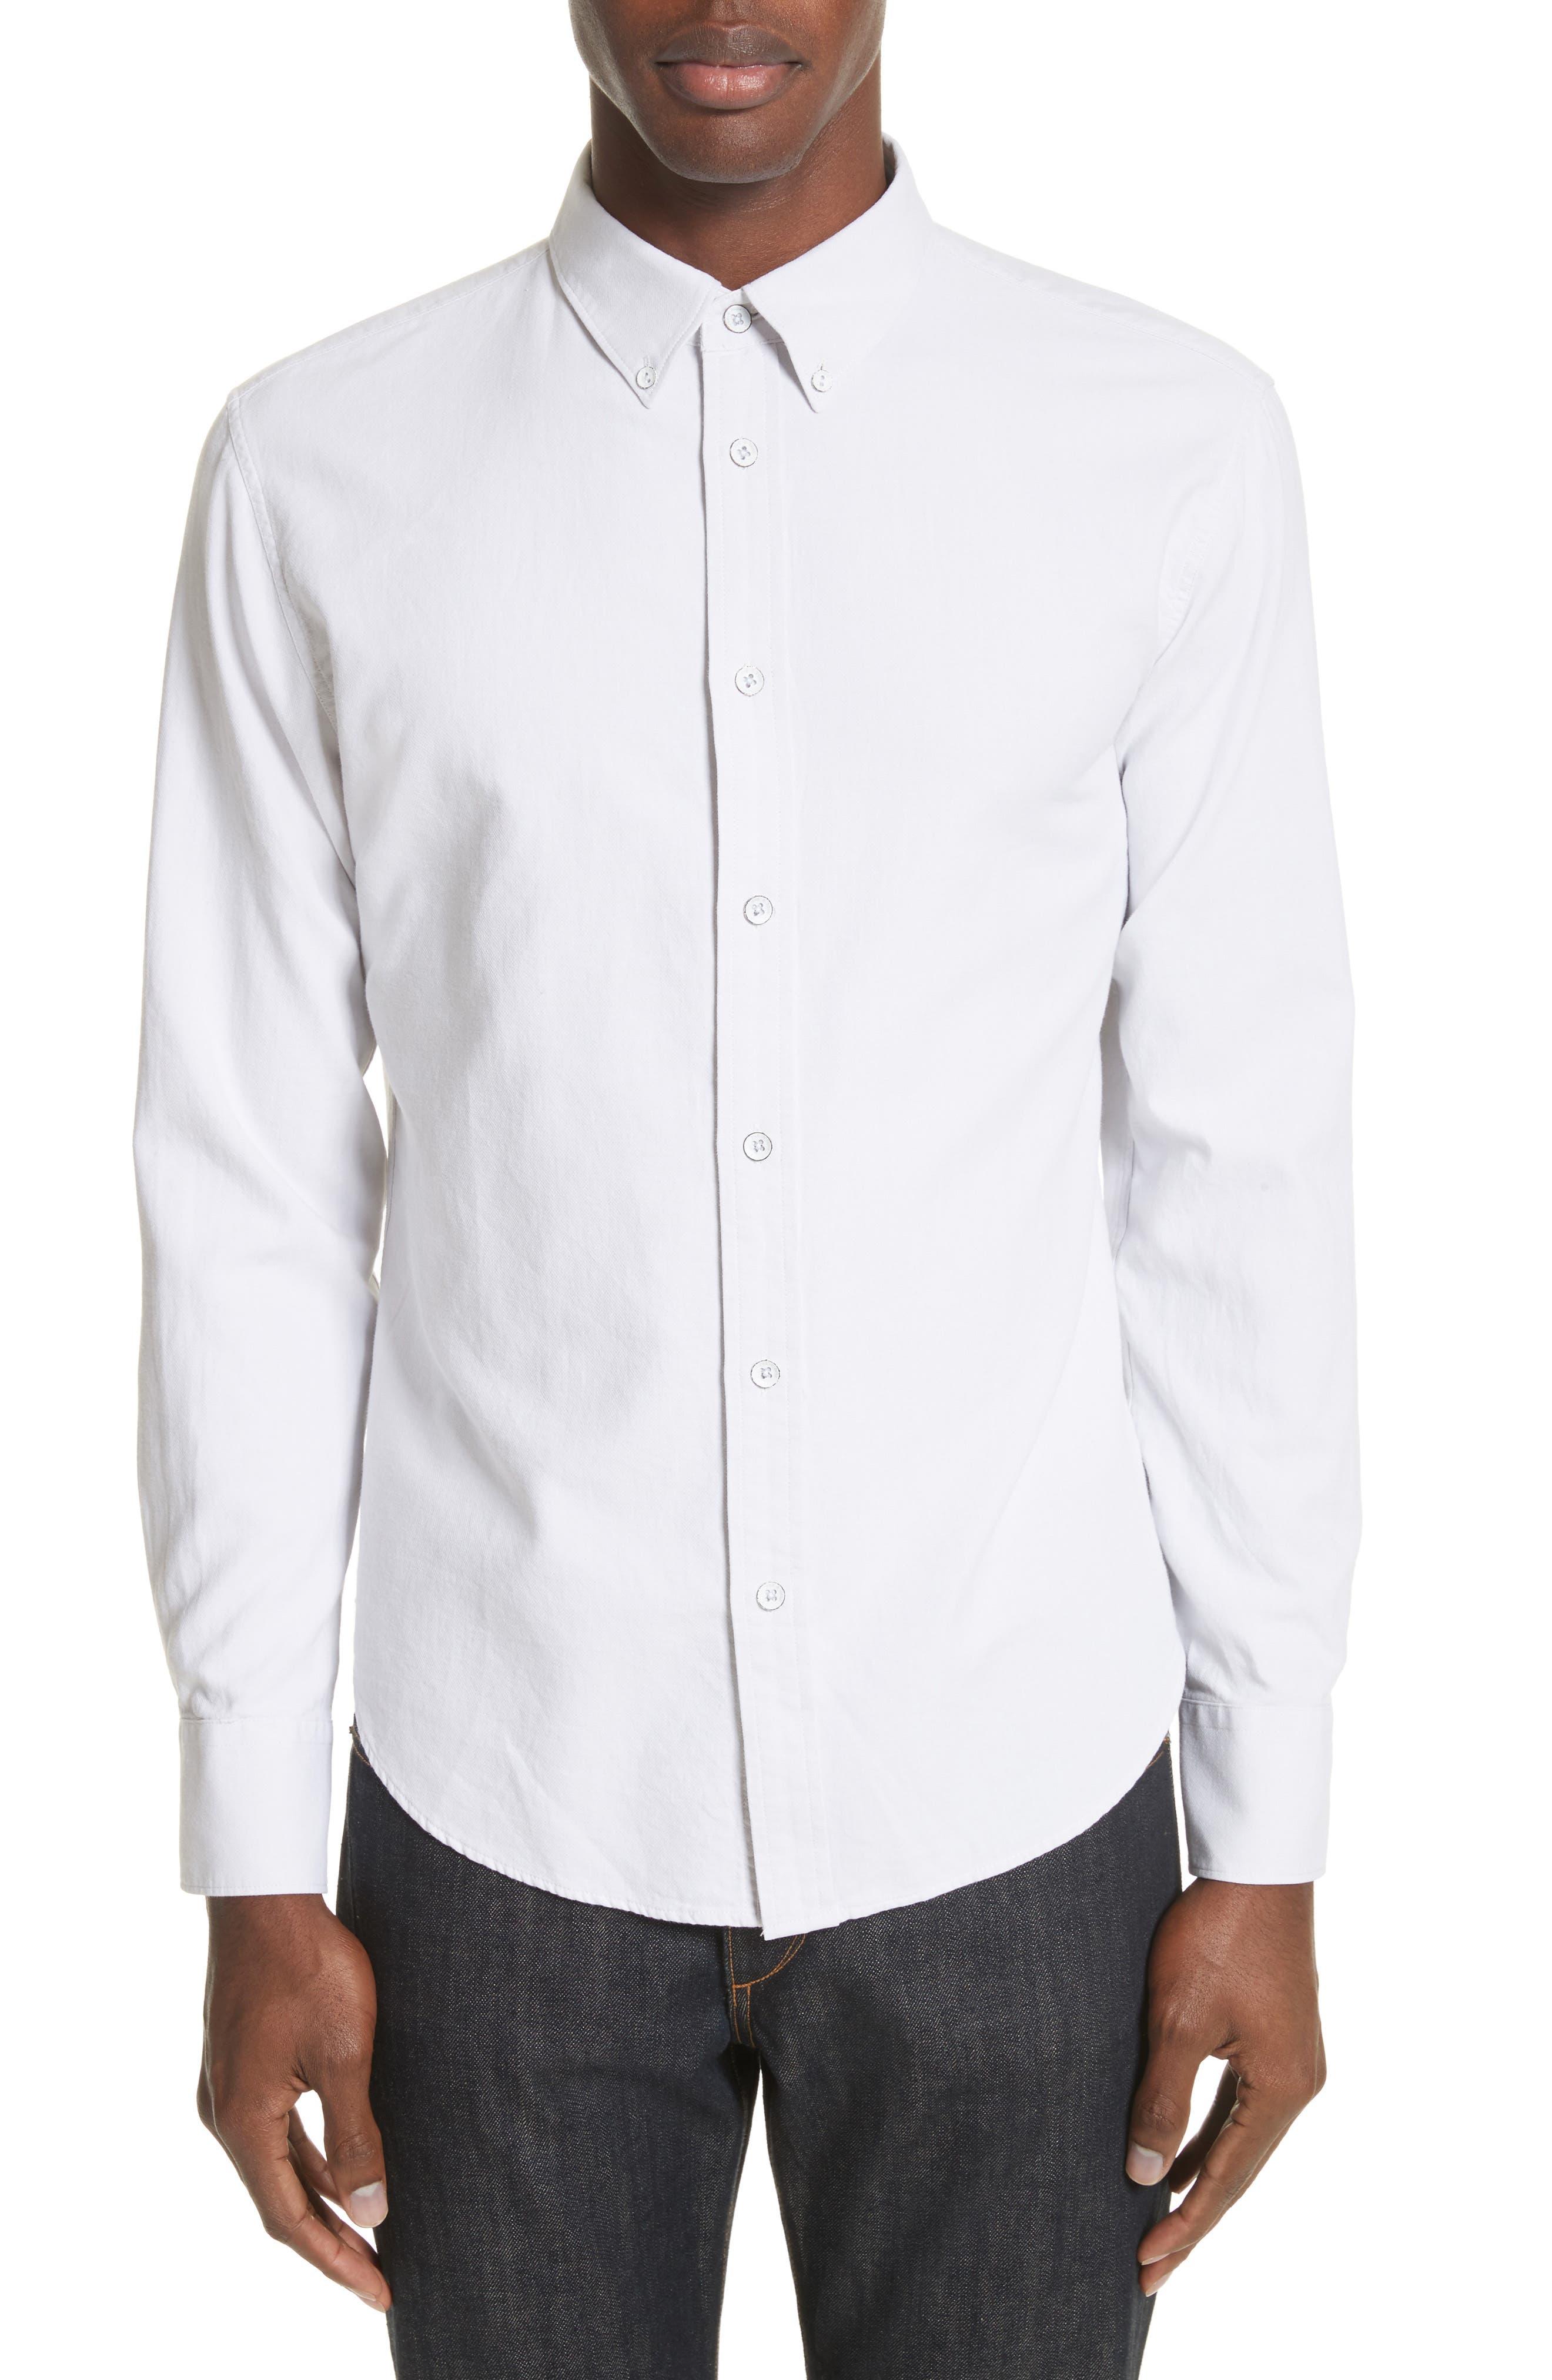 RAG & BONE Tomlin Fit 2 Shirt, Main, color, 179